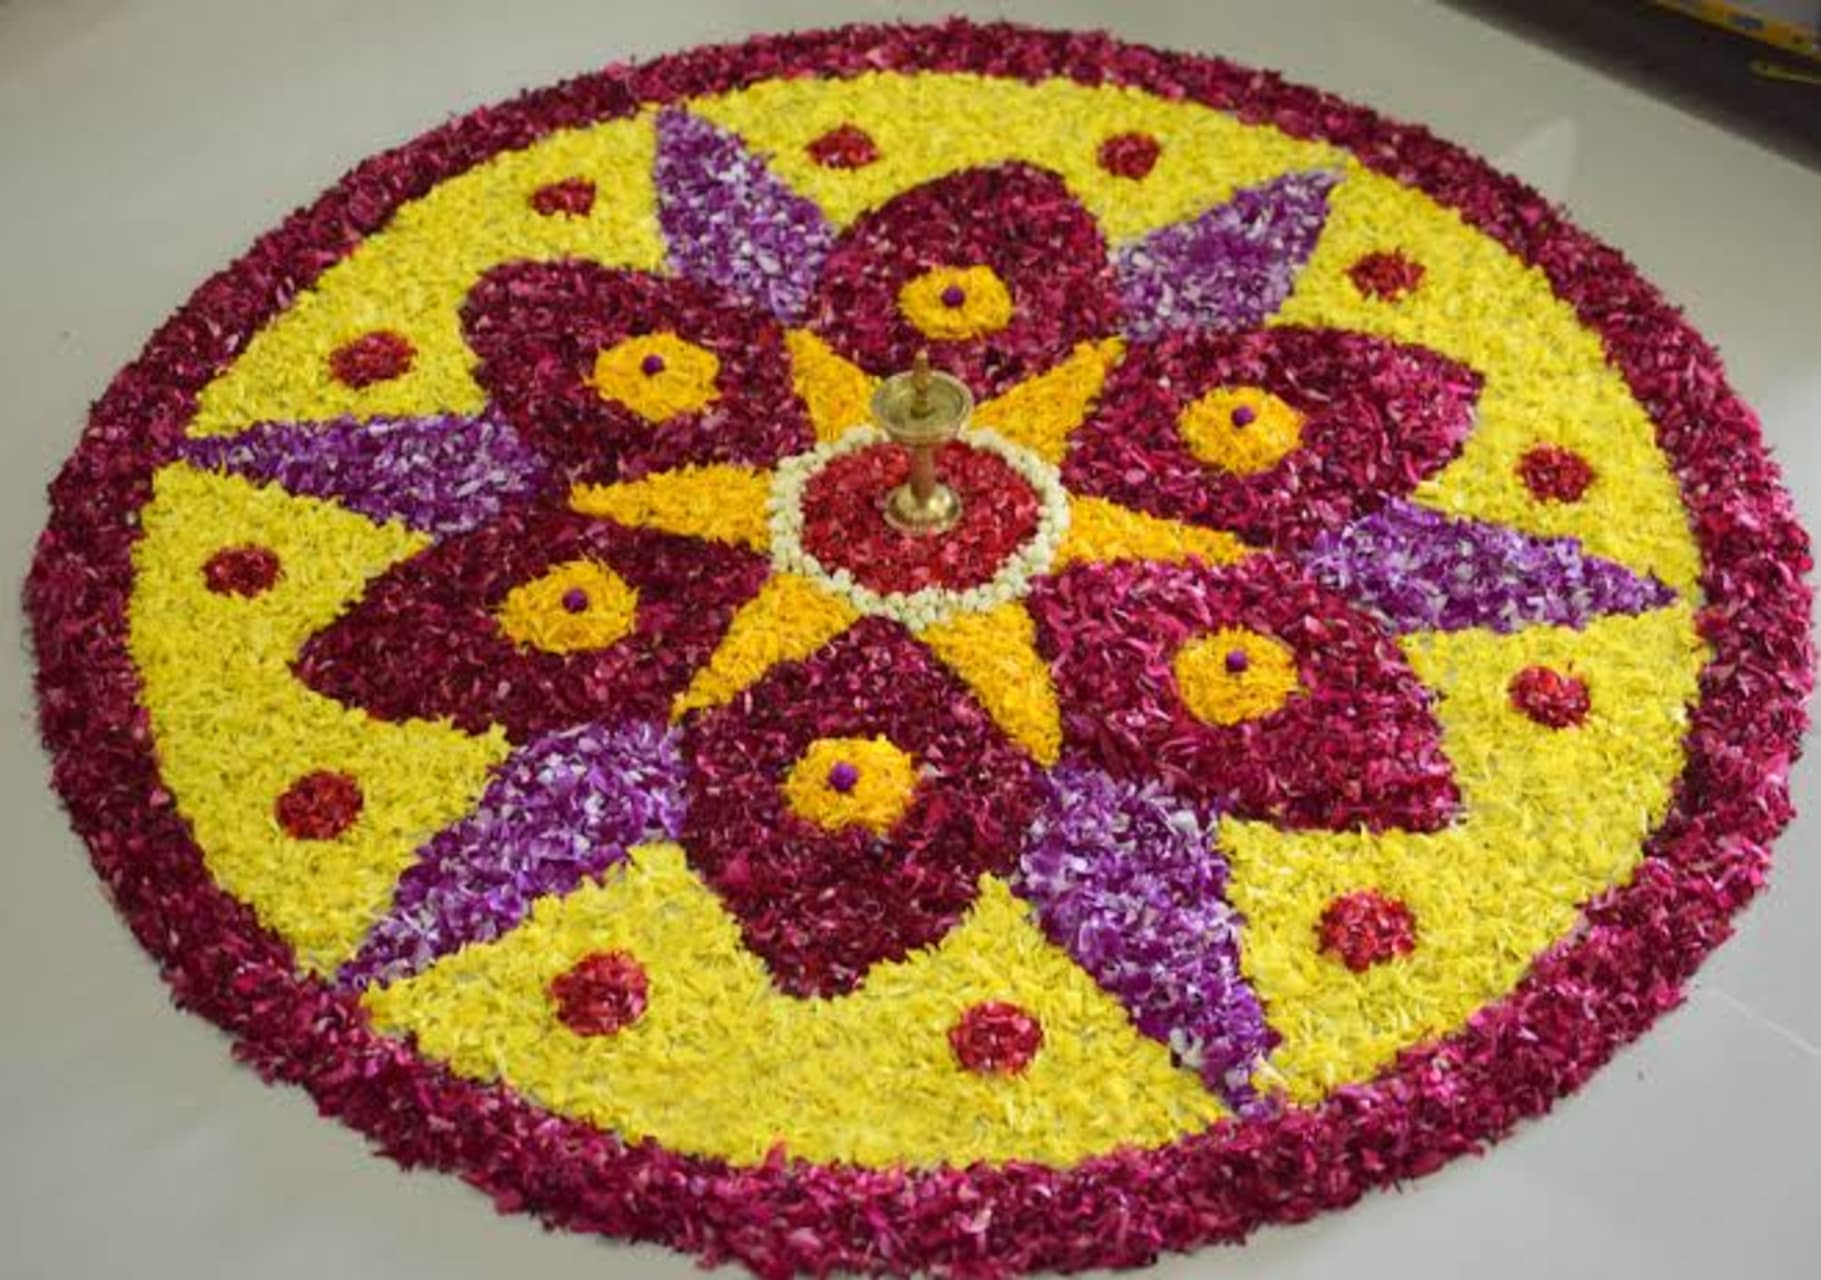 Kerala - Onam: Myths and Celebrations of Kerala's Native Festival